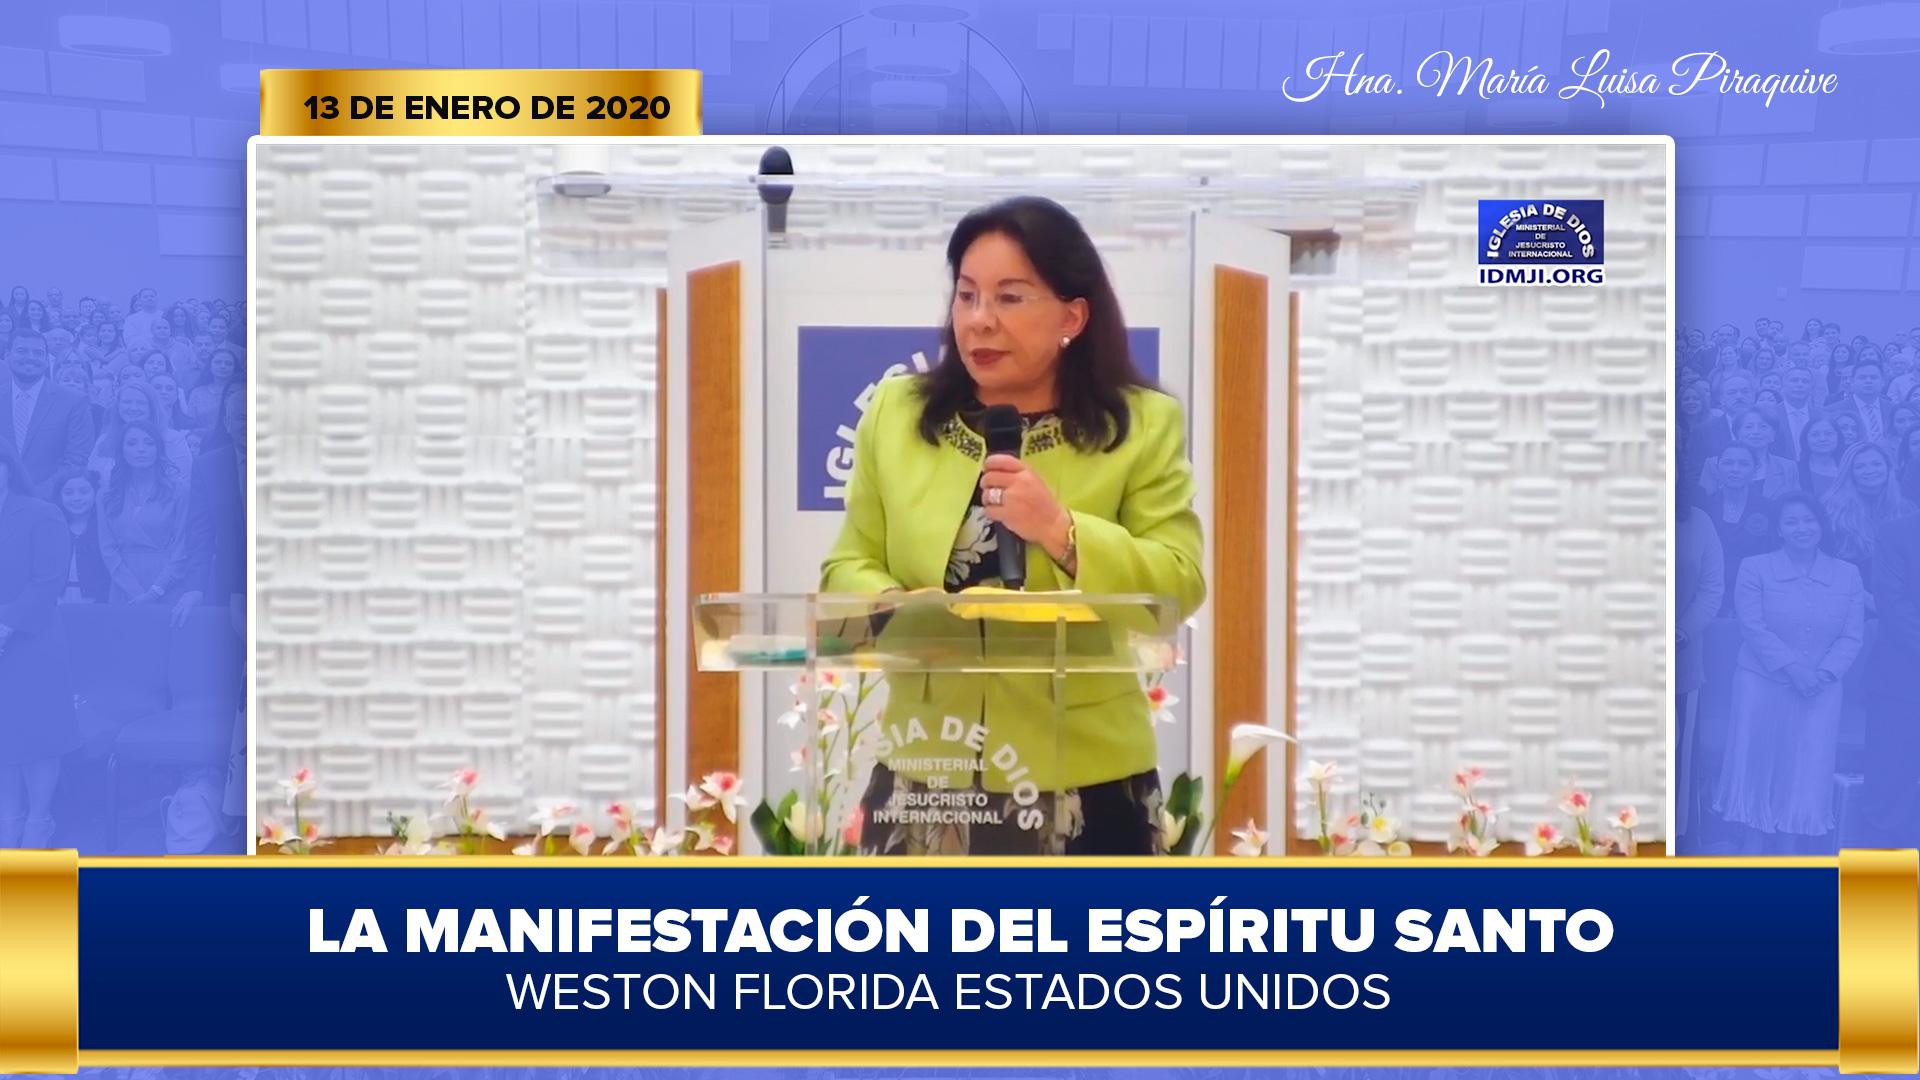 Enseñanza: La manifestación del Espíritu Santo – Weston, Florida, USA – 13 ene 2020 – Hna. María Luisa Piraquive